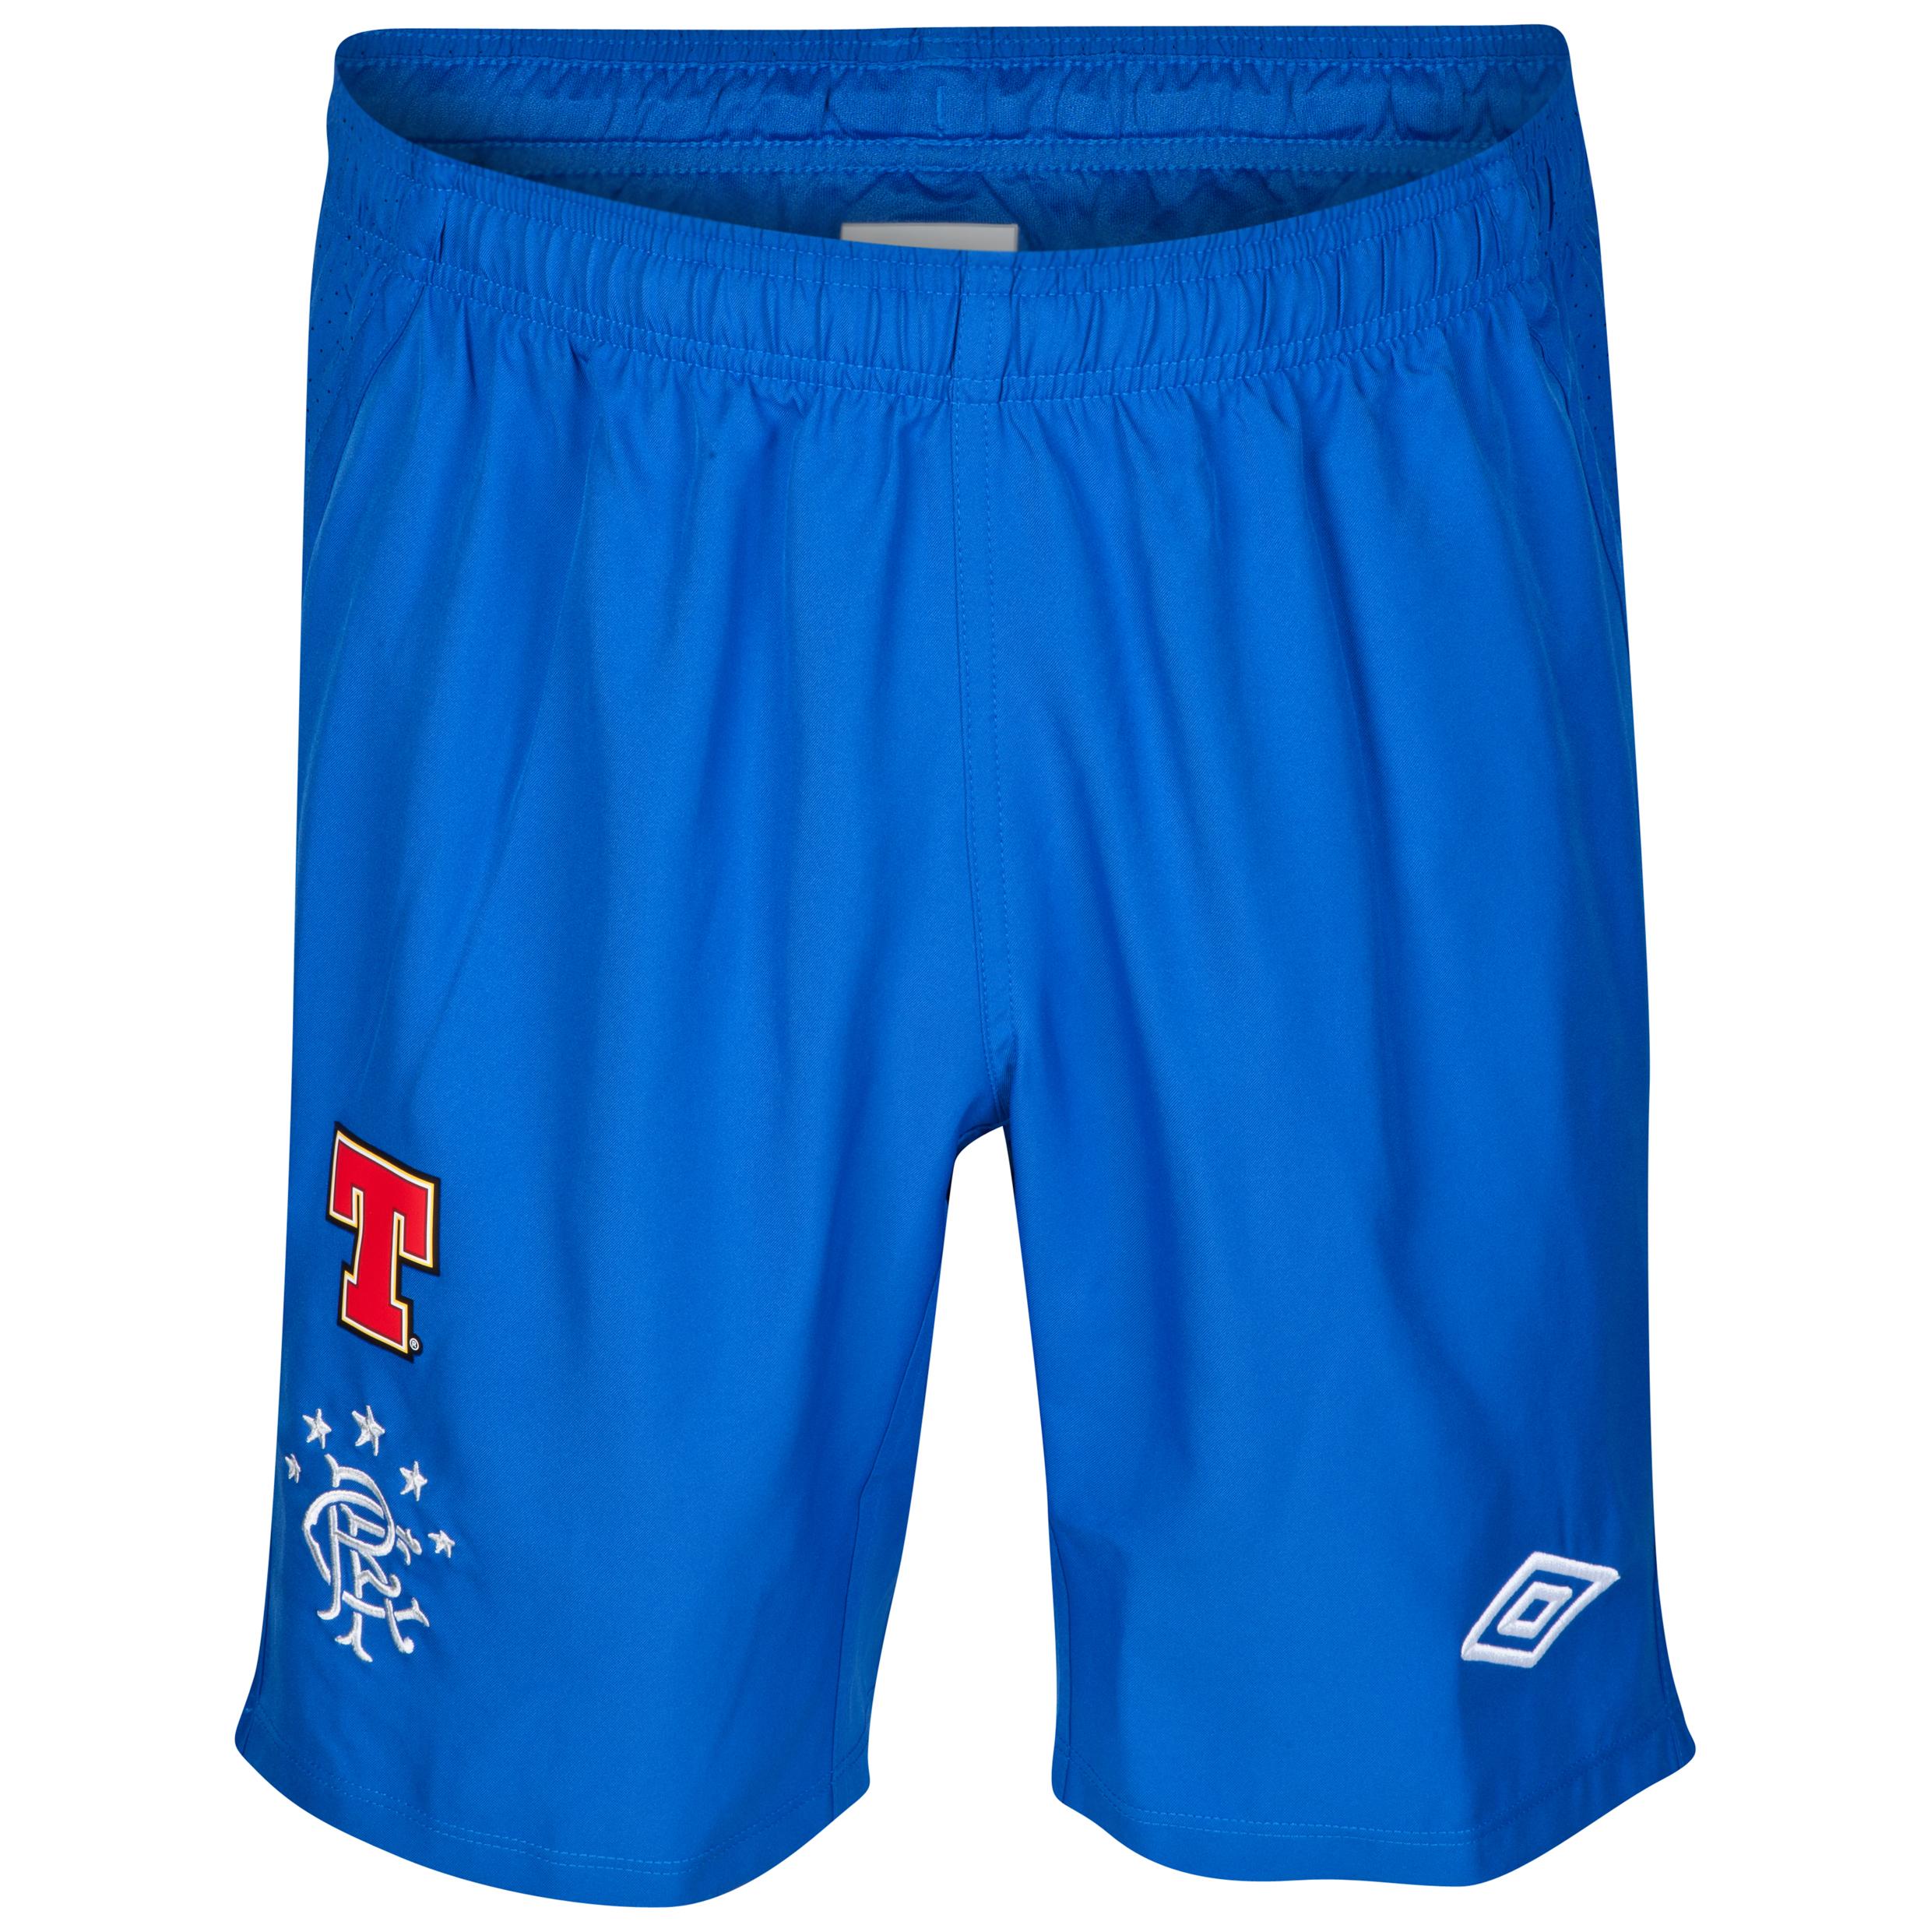 Glasgow Rangers Away Shorts 2012/13 - Kids